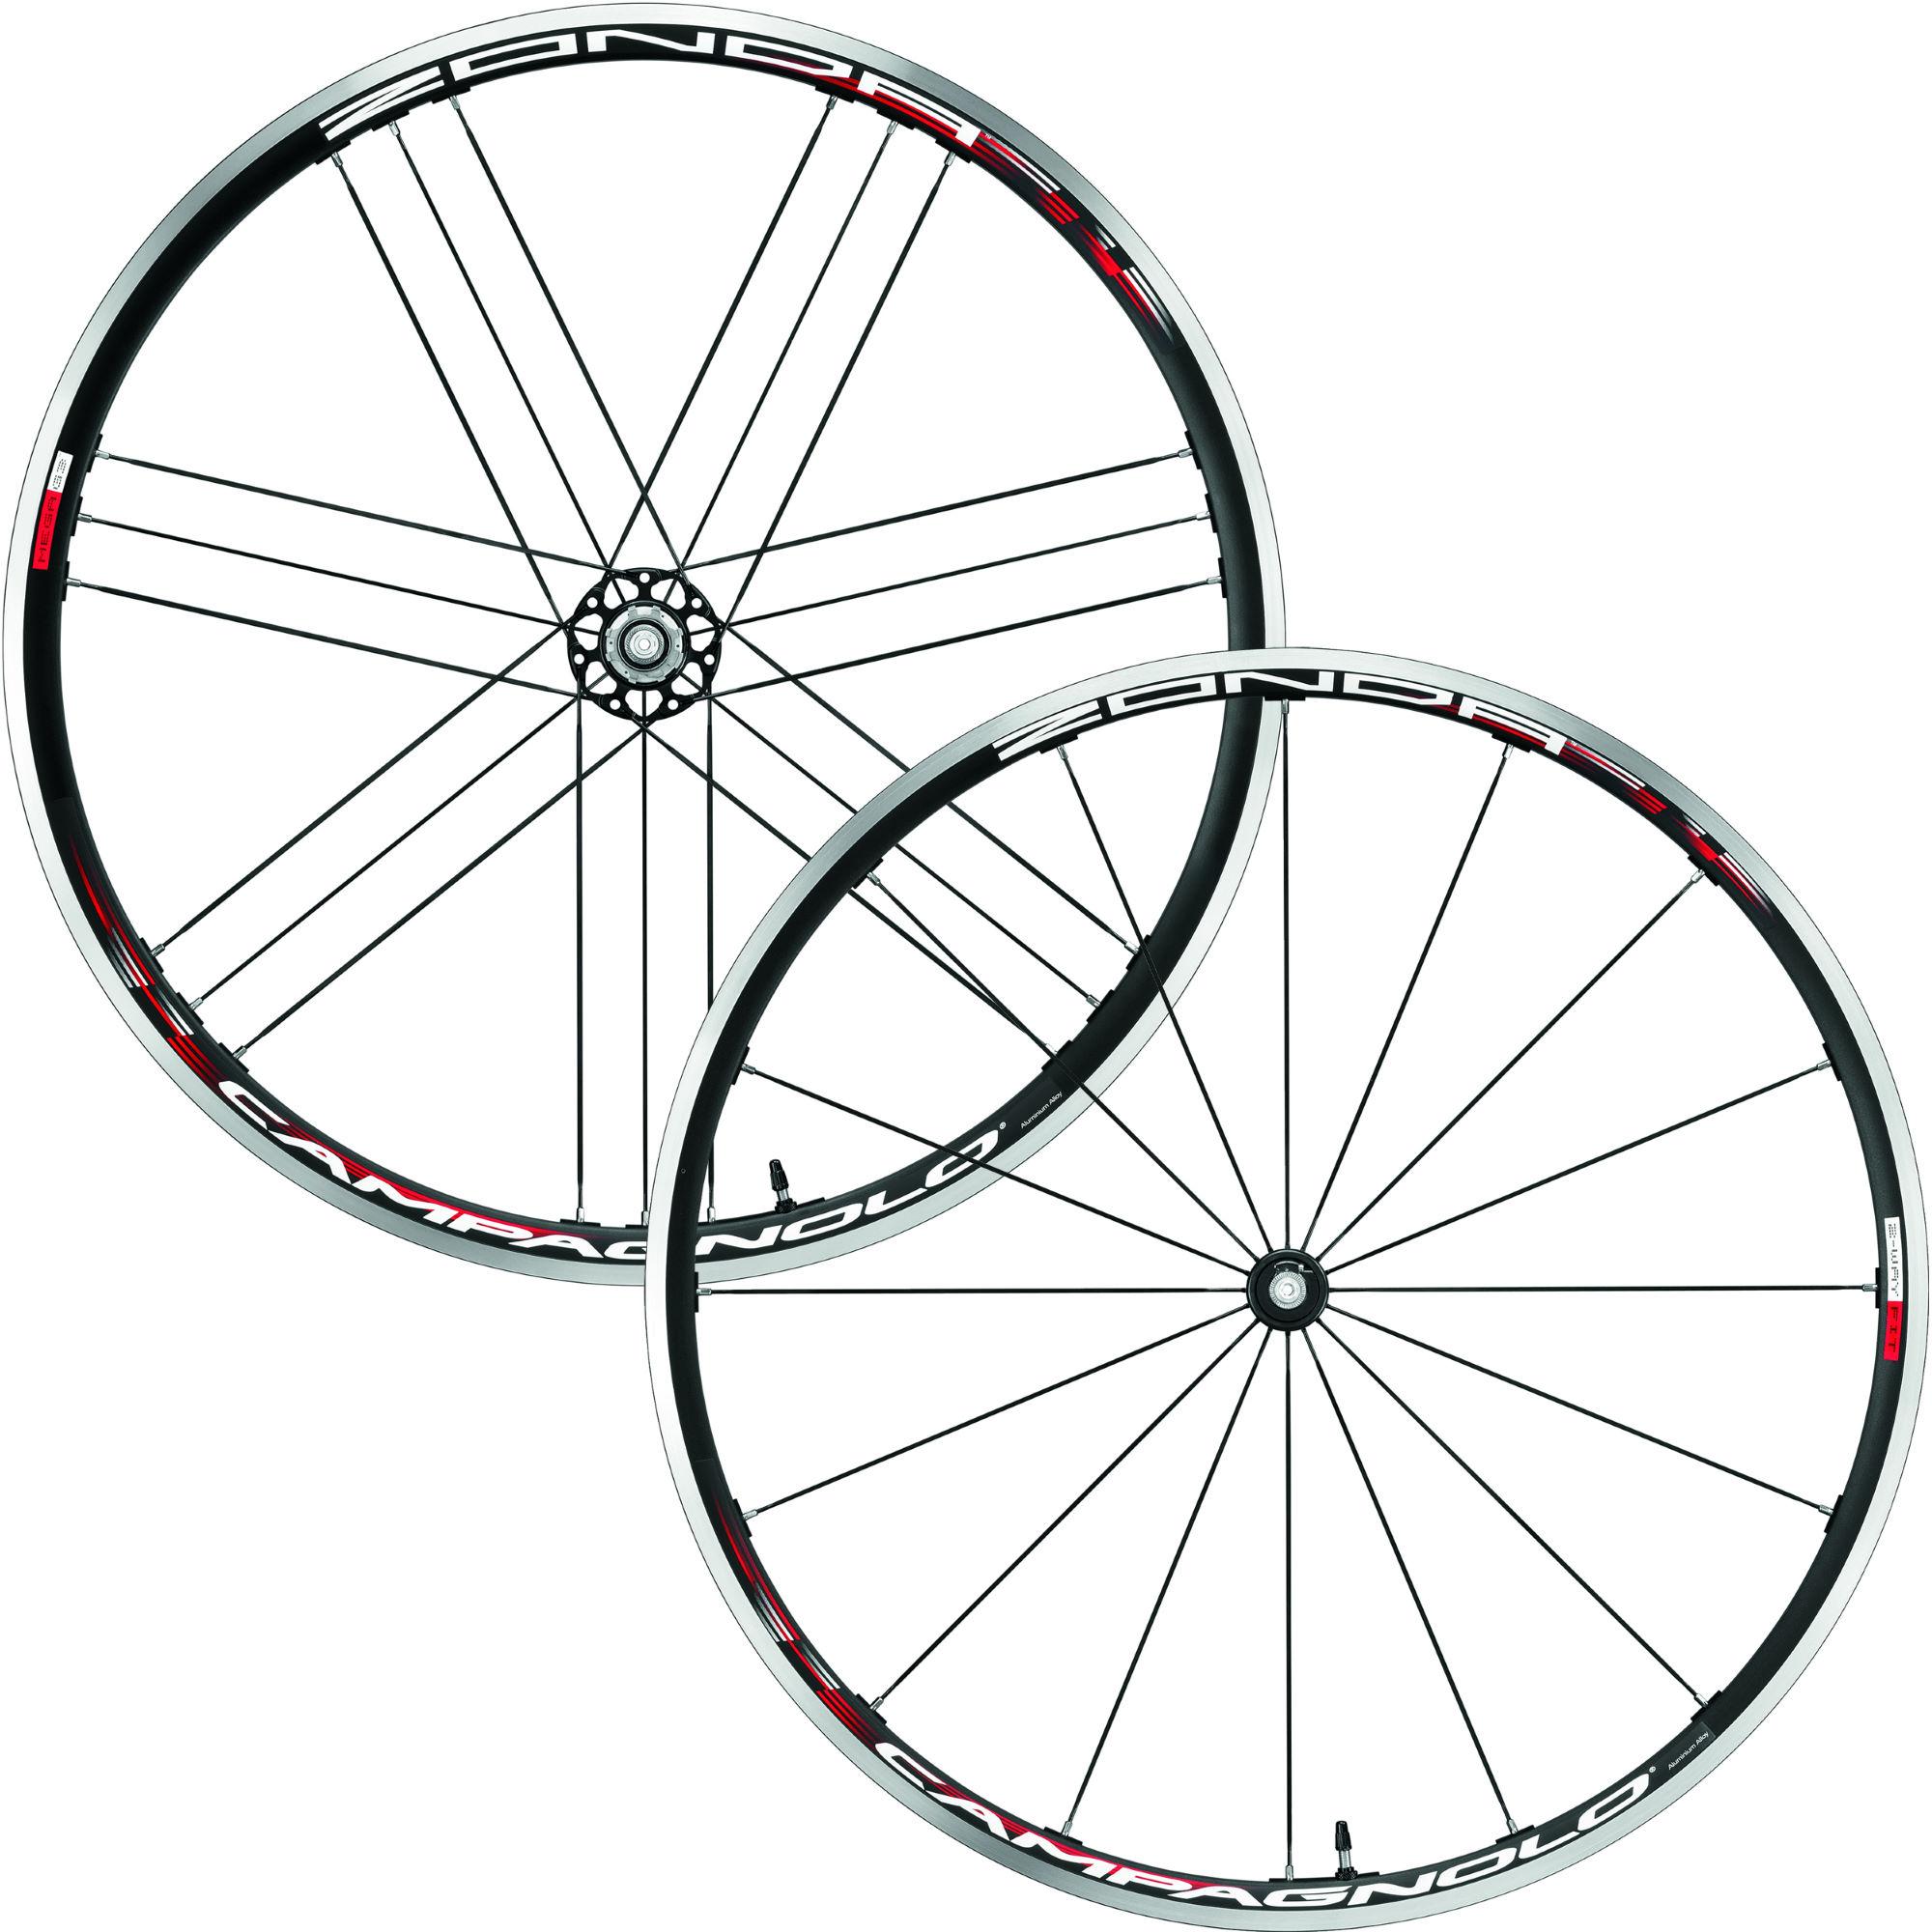 campy-zonda-wheelset